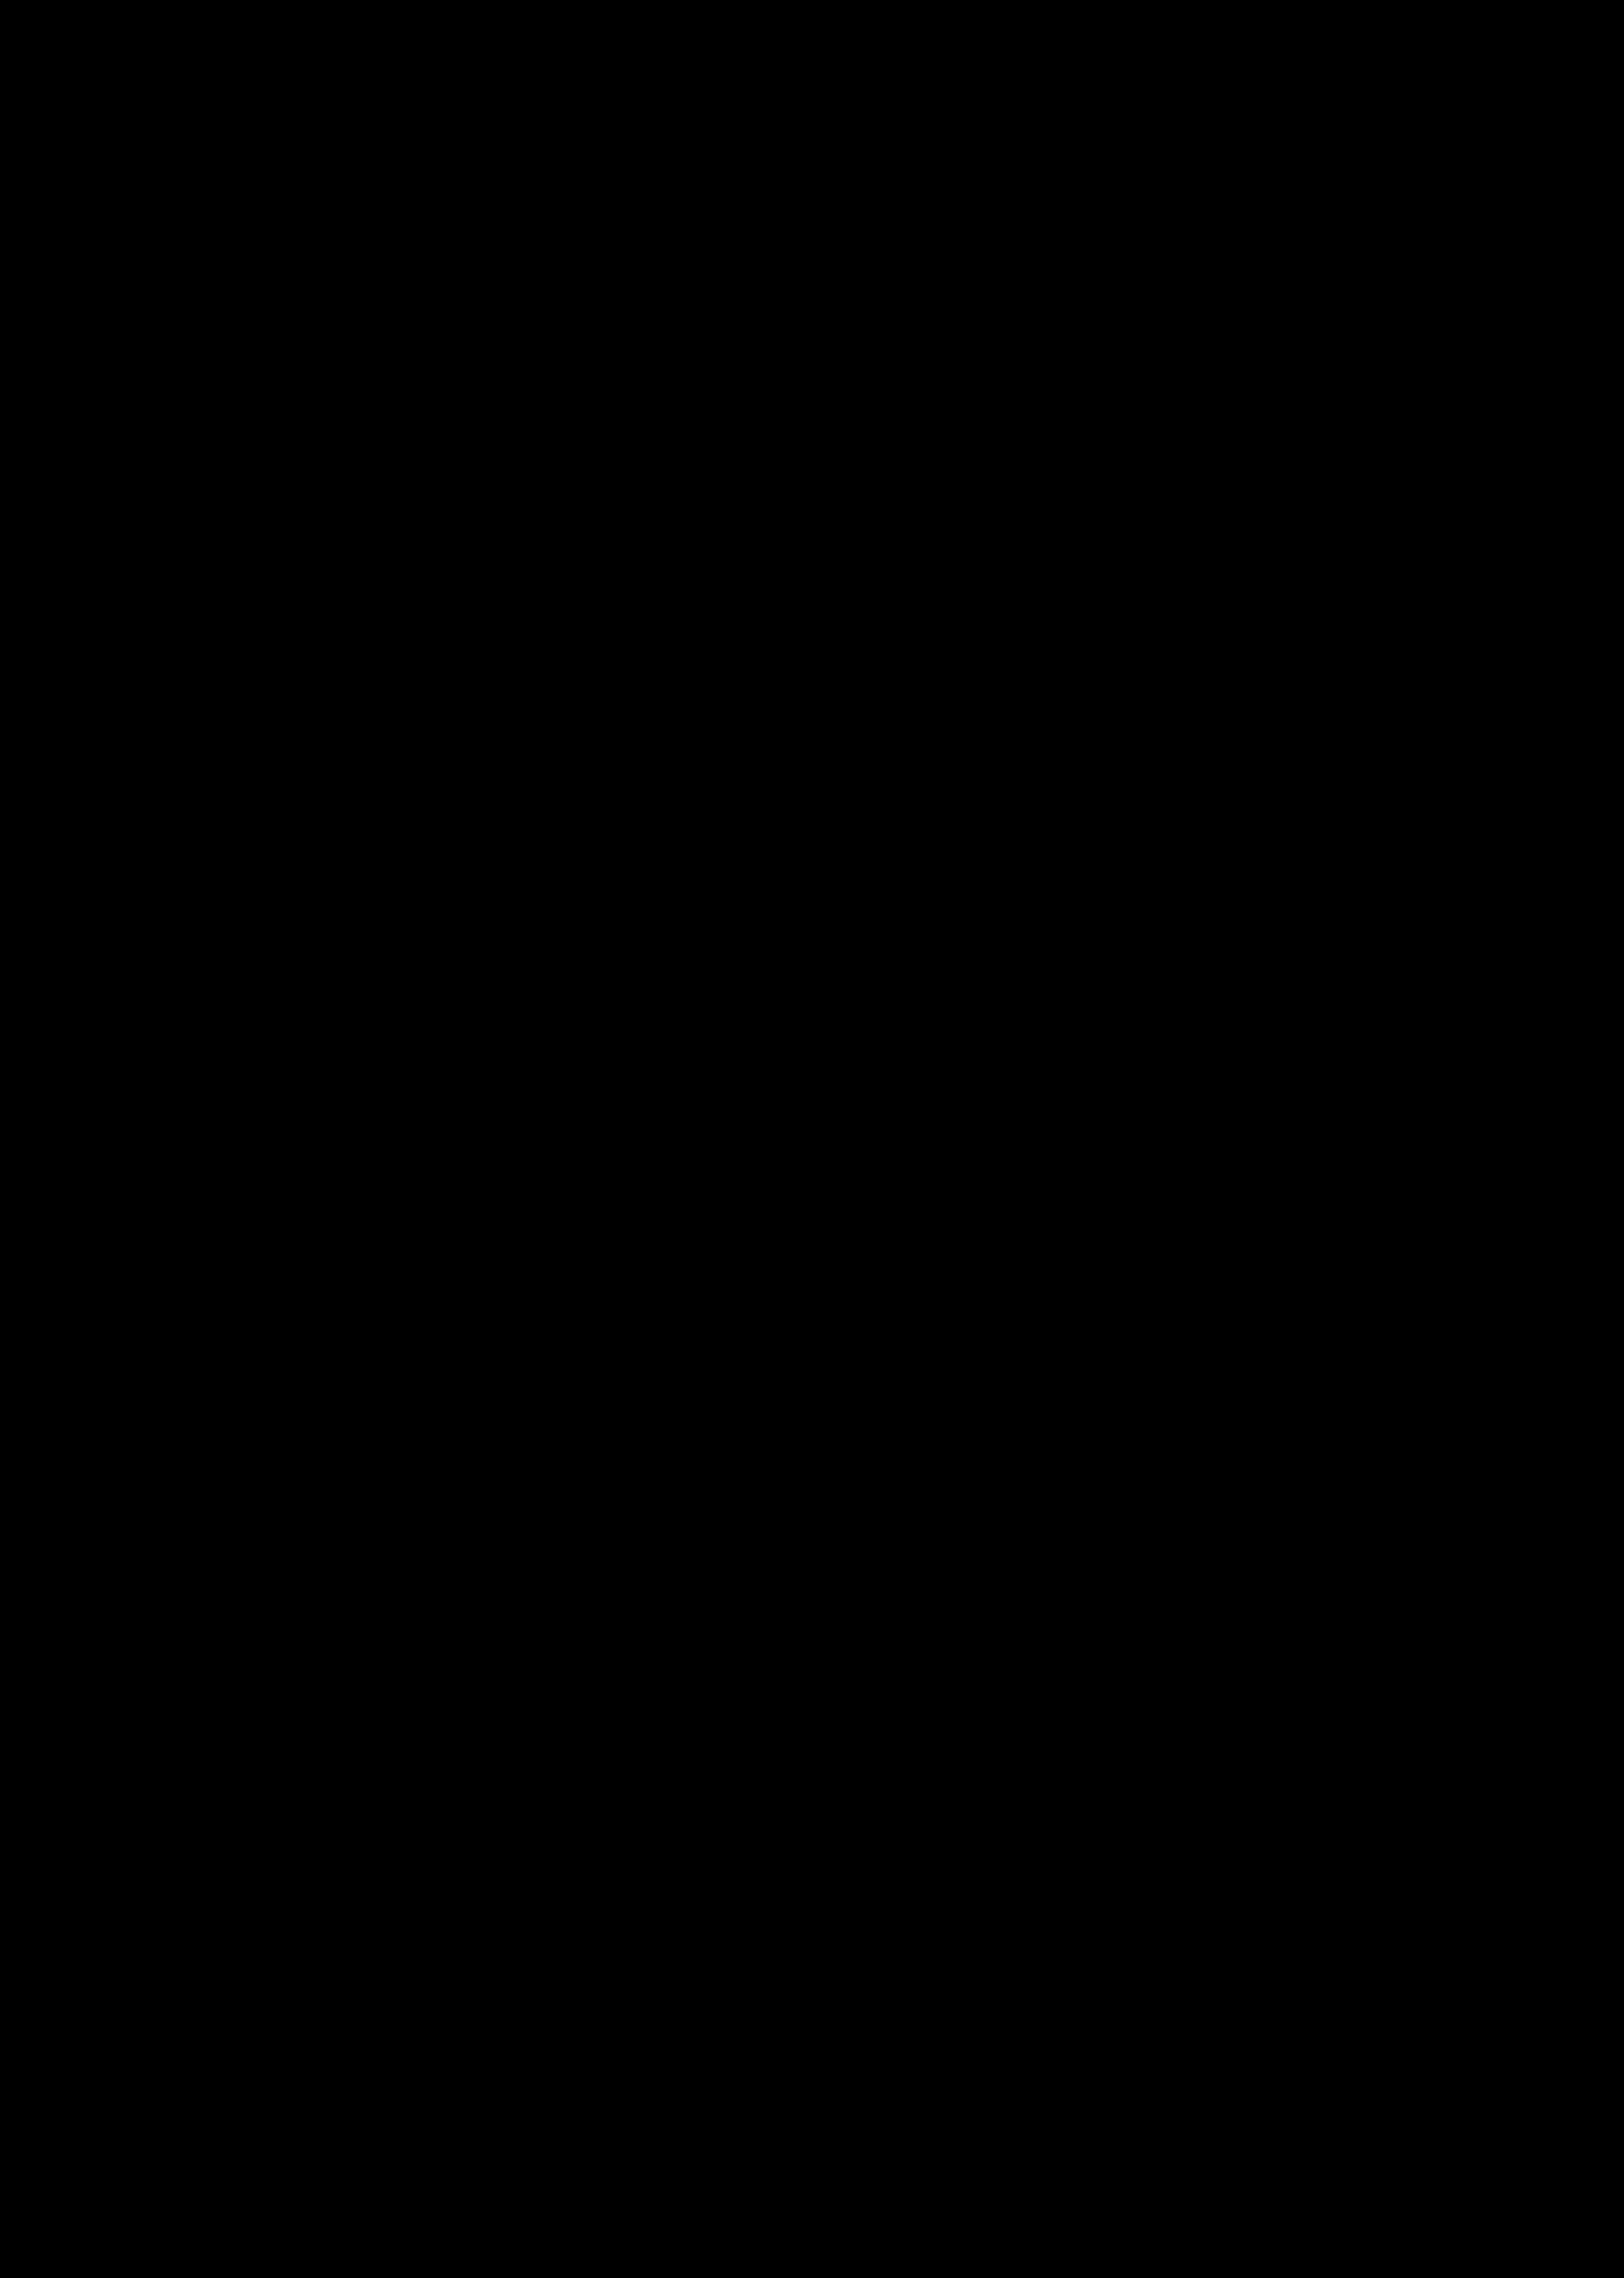 File usvalandingeagle svg wikimedia. Headstone clipart bird